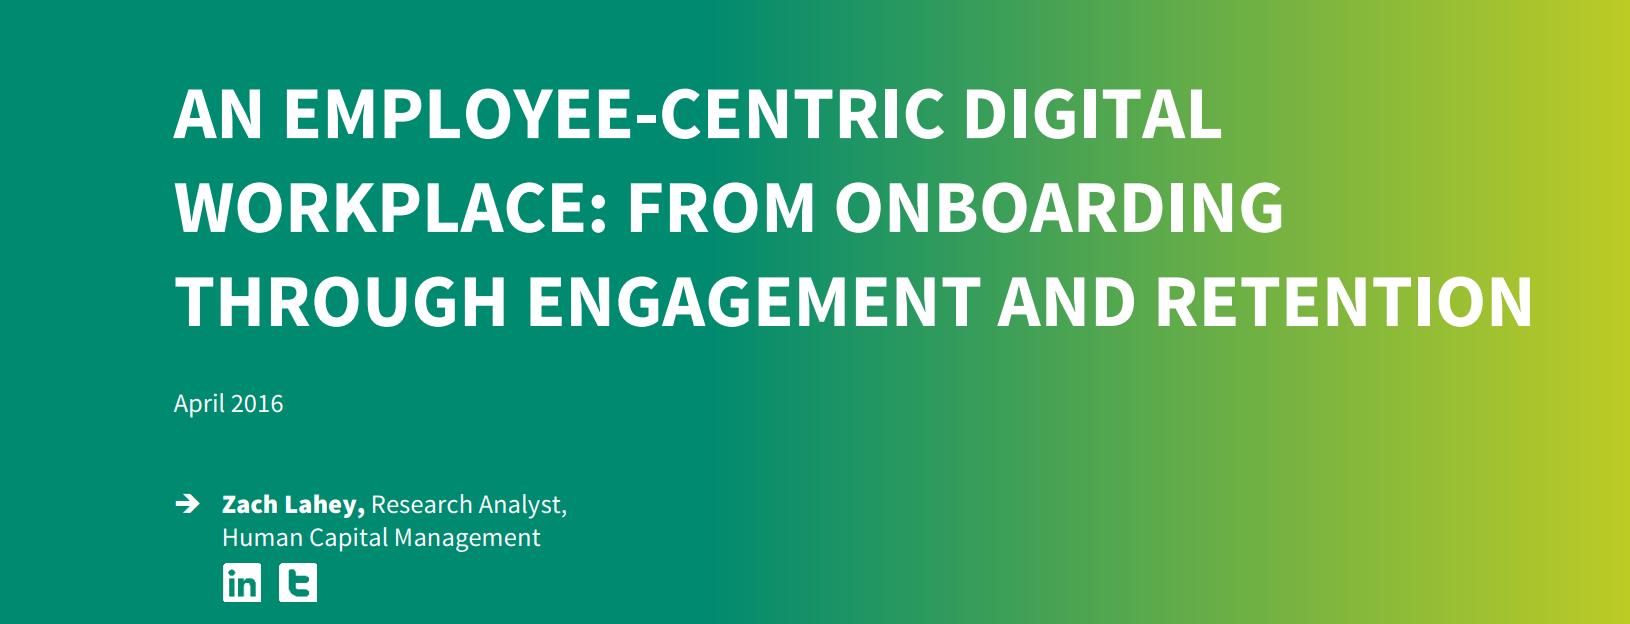 An Employee Centric Digital Workplace